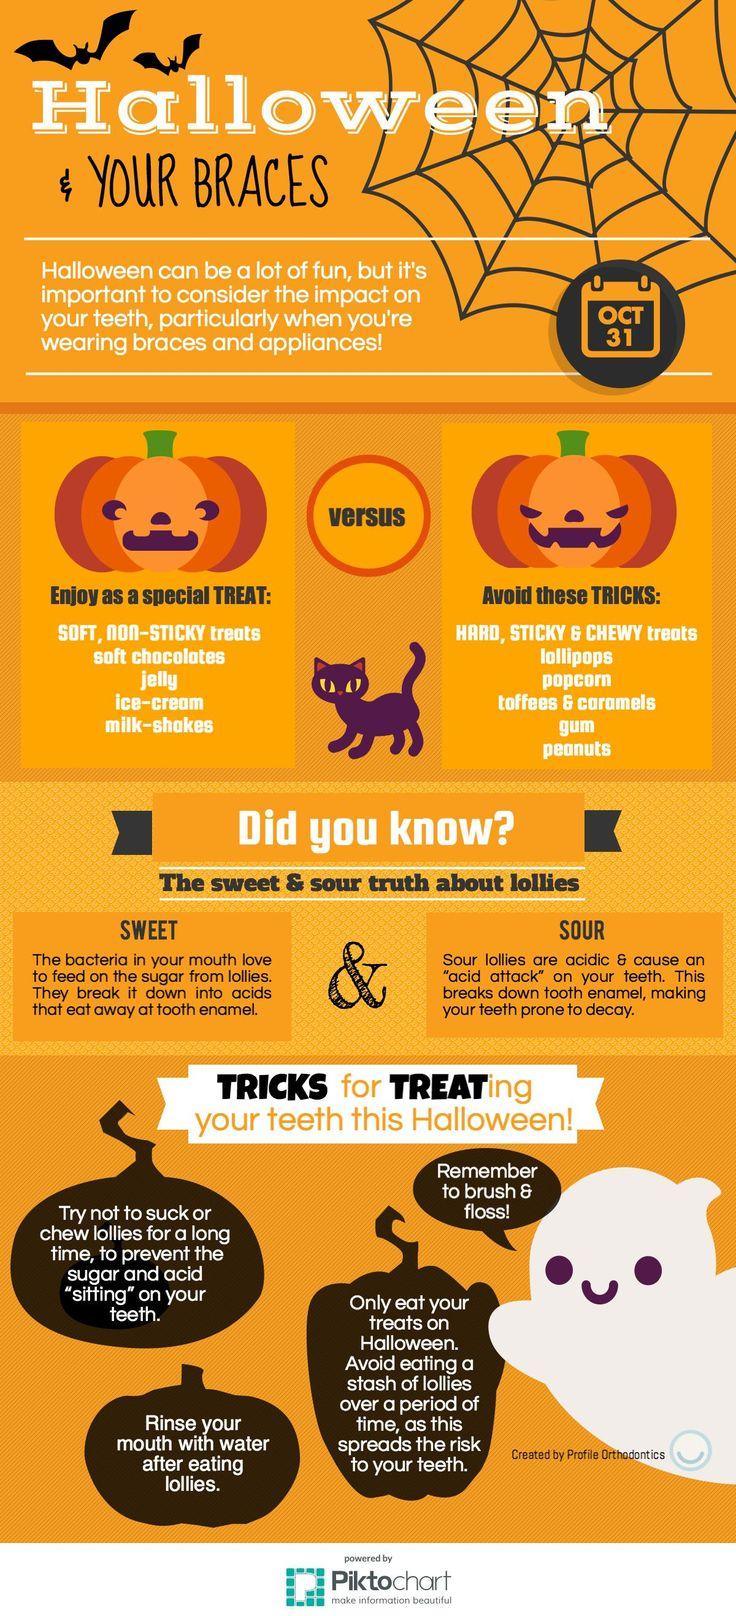 Tips for your braces during Halloween Visit Journey Kids Dental in Fort Lauderdale for excellent dental care! http://journeykidsdental.com